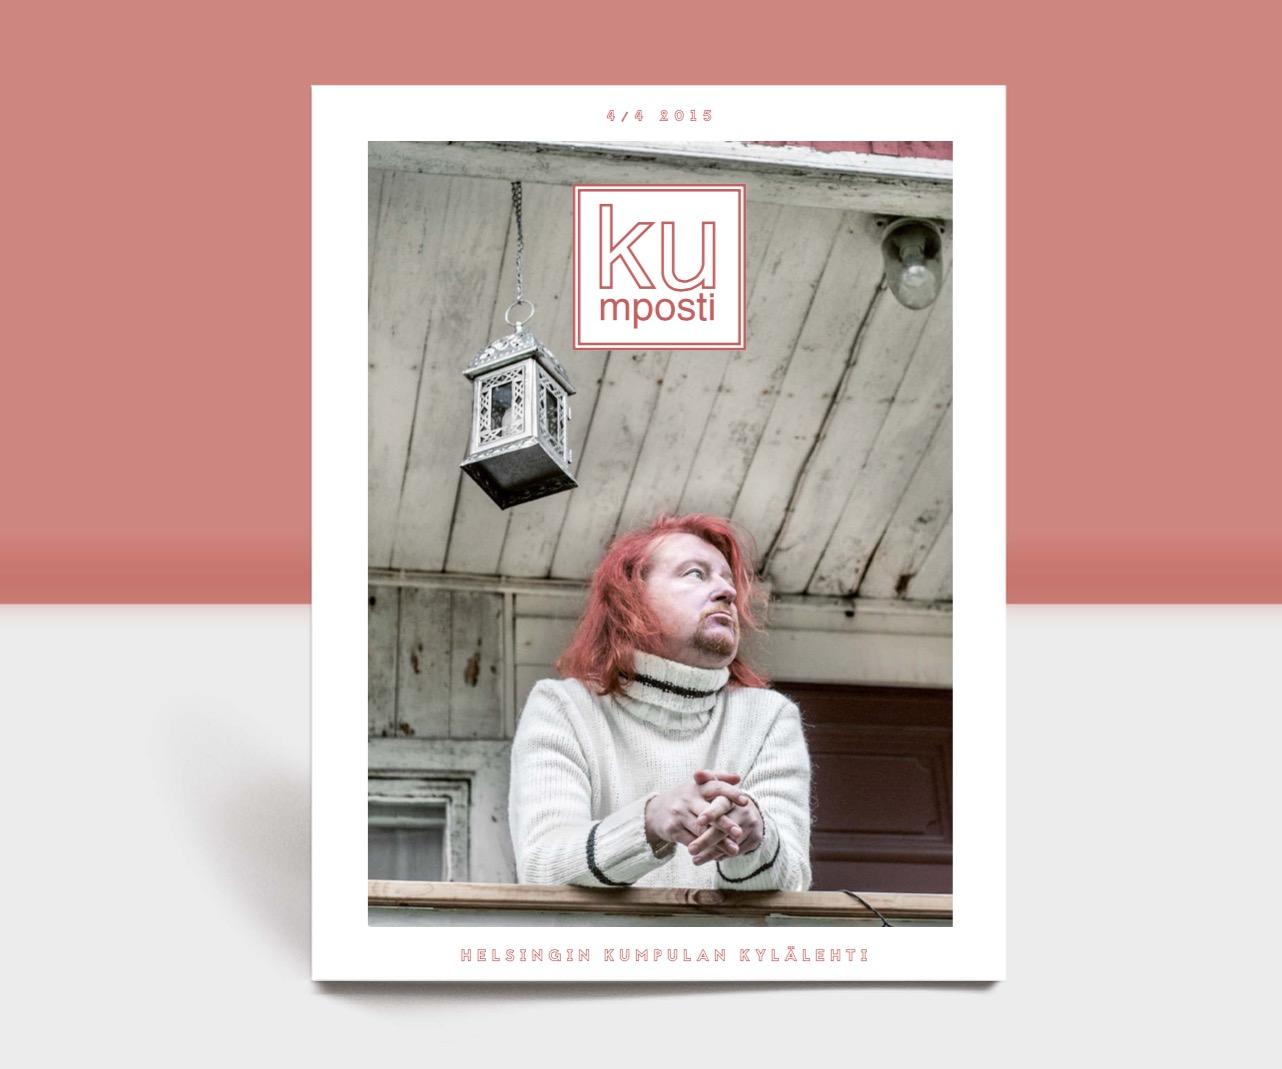 Kumposti 4/2015-thumbnail